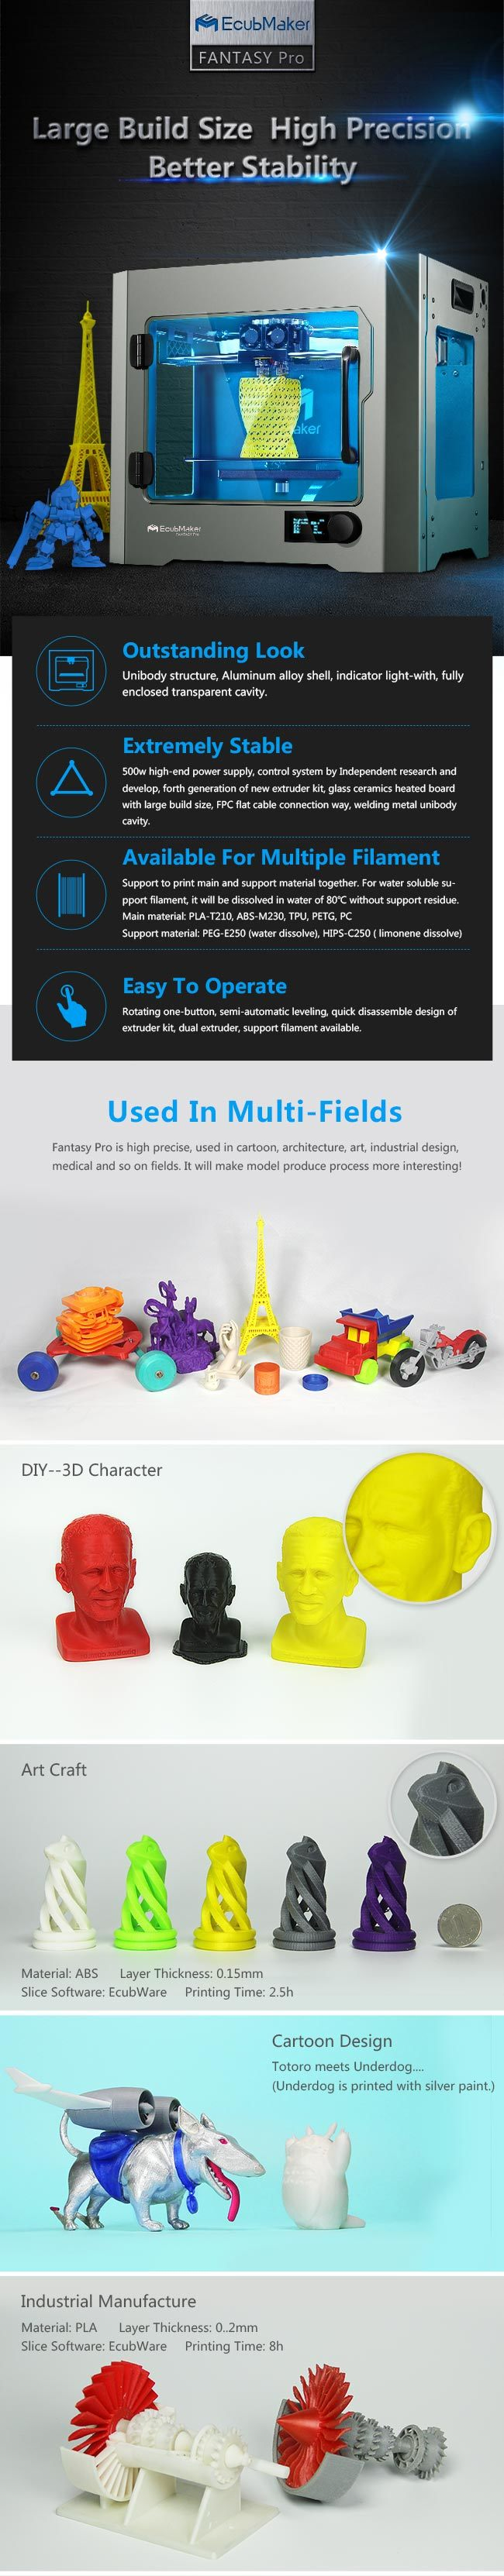 Ecubmaker OLED Screen Printing Machine/3D Multi Color Printer Usage Architecture Machine/High Precision Large 3D Printers